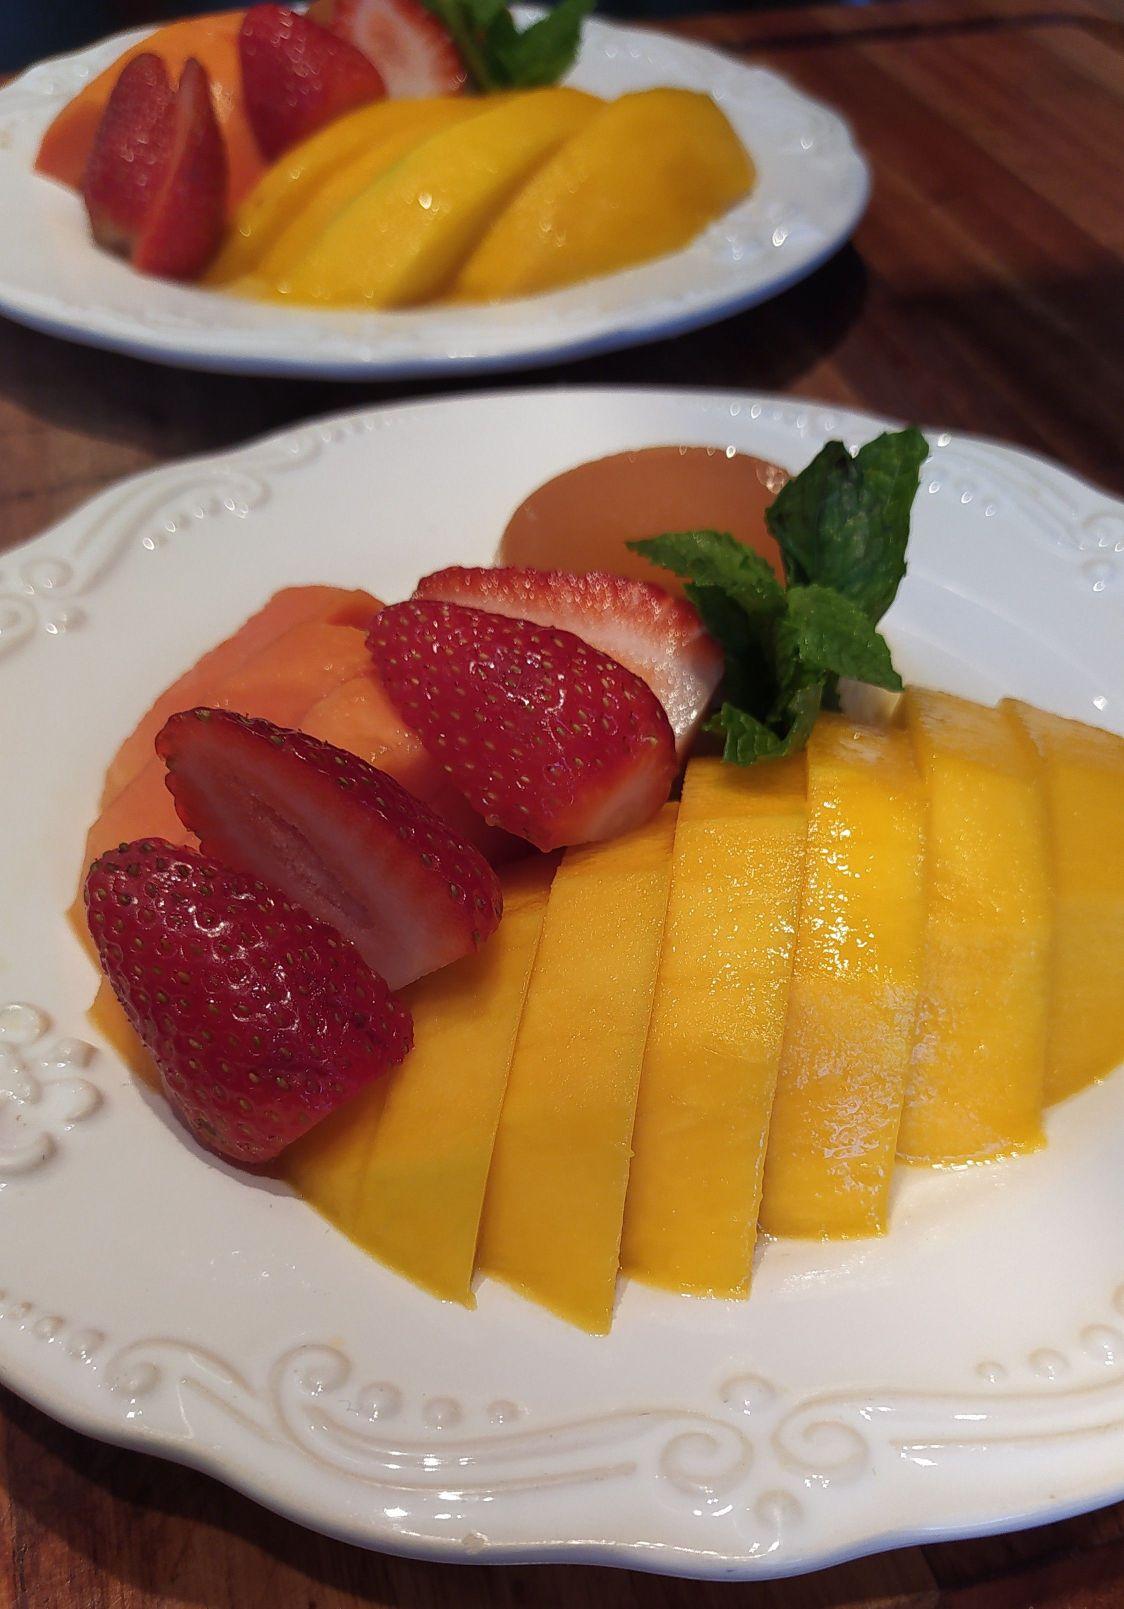 Panaché de Frutas do dia